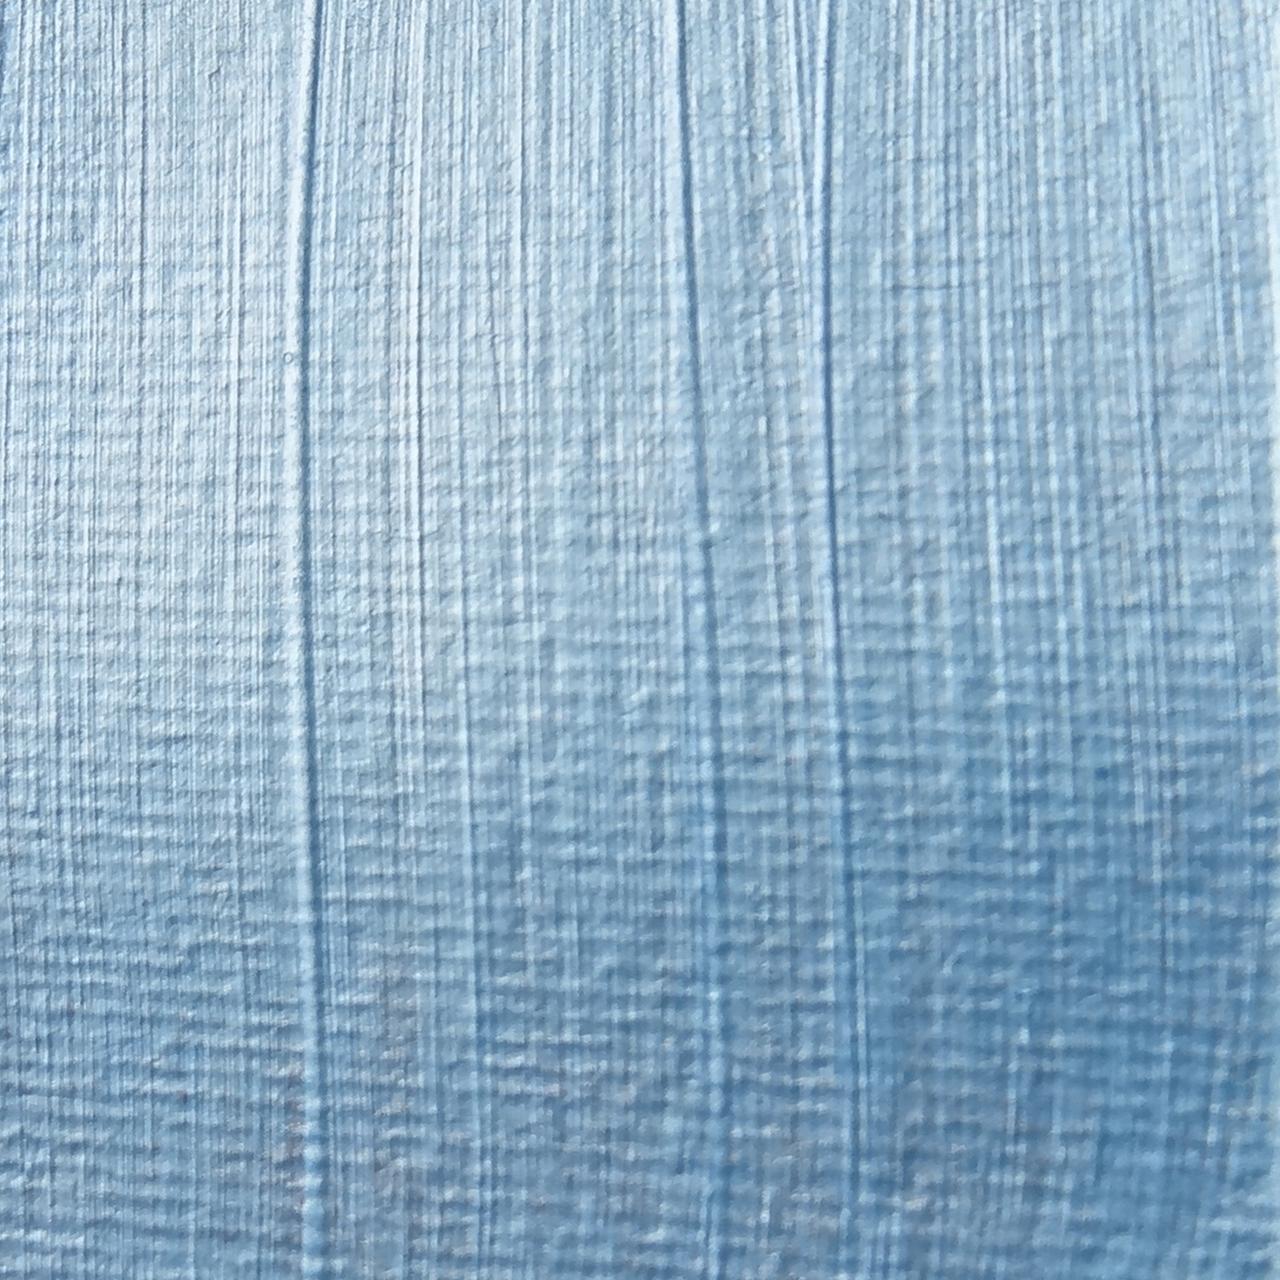 Декоративная краска, Pearl and Metallic, ларимар, 50 мл, ScrapEgo